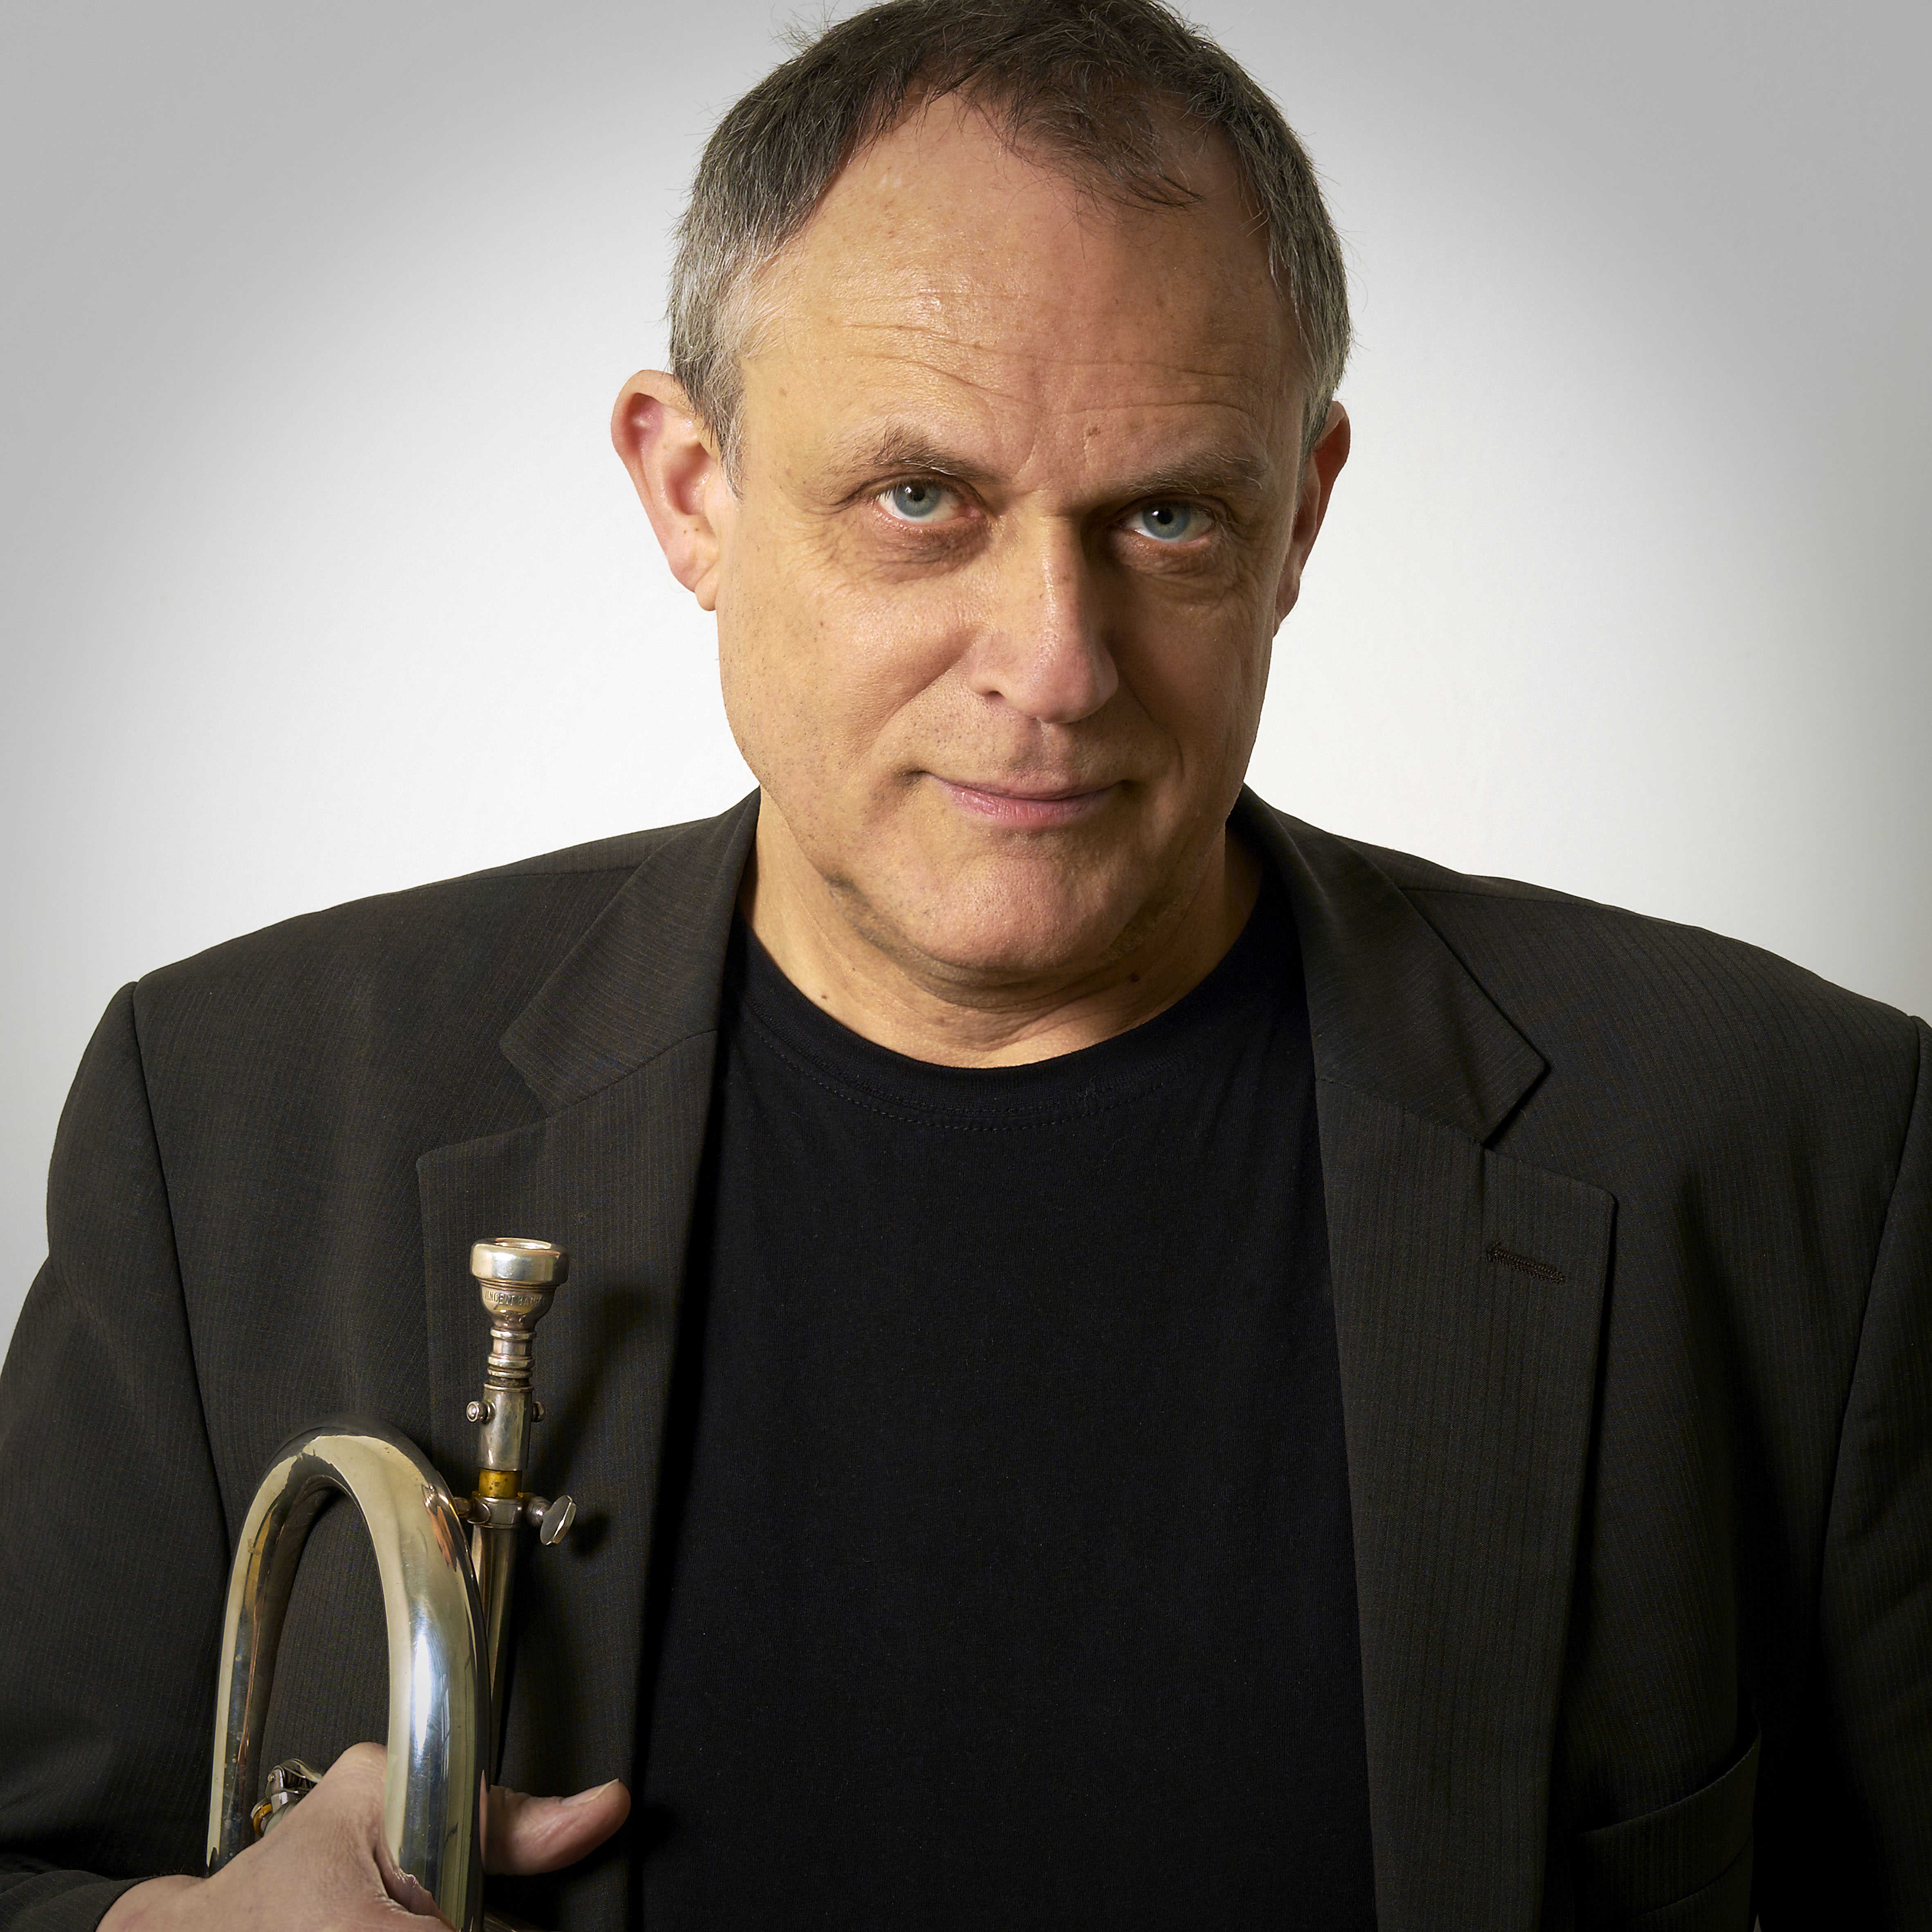 Franz-David Baumann